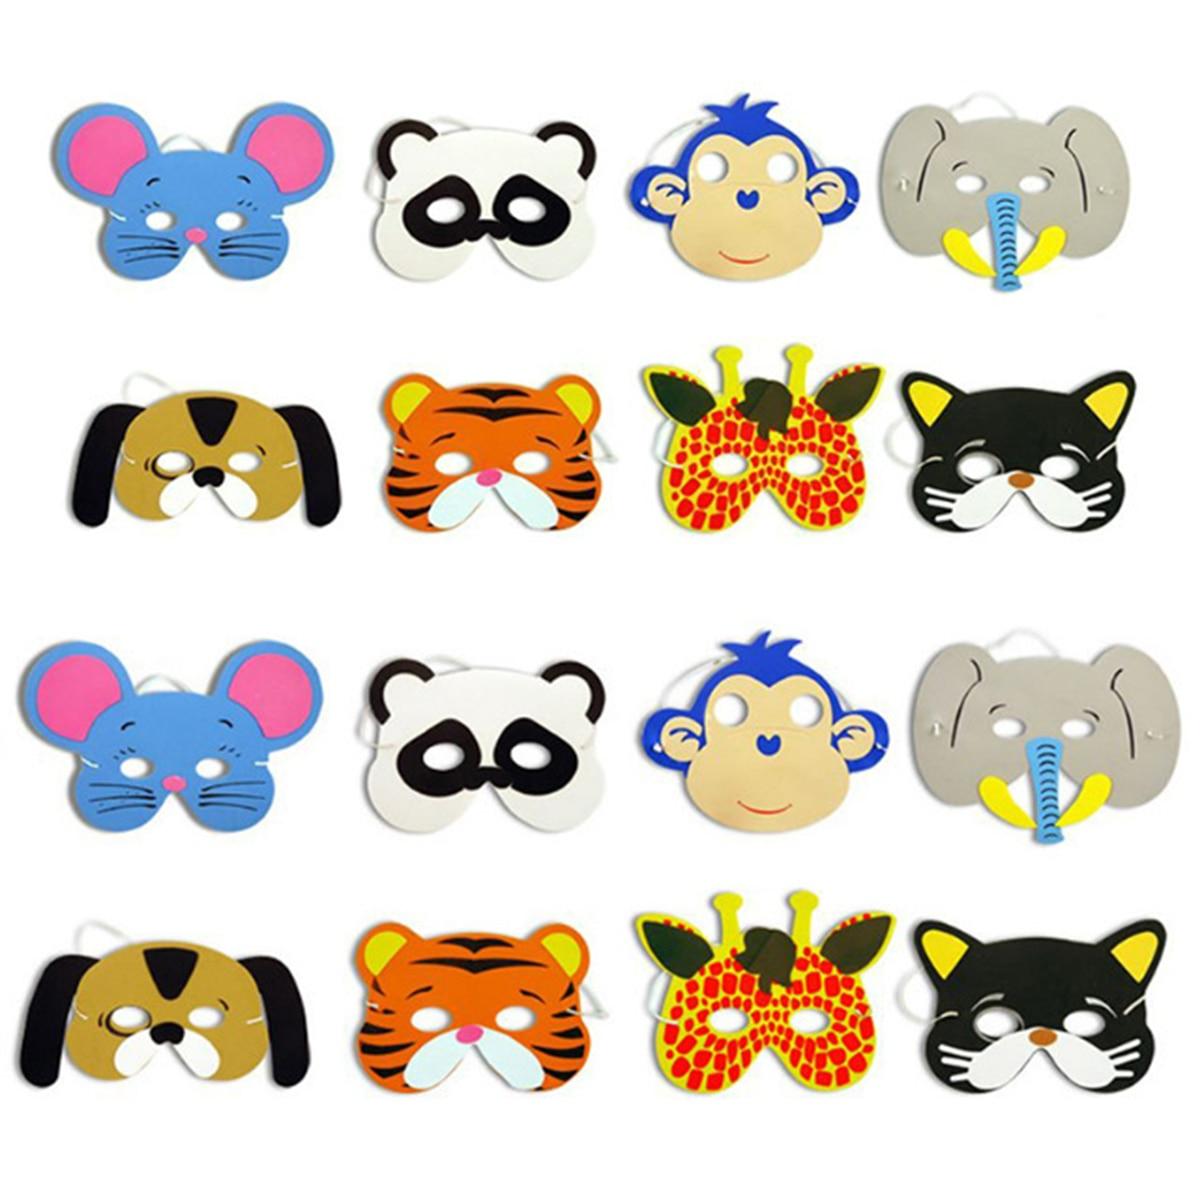 12pcs Mask Birthday Party Supplies EVA Foam Animal Masks Cartoon Kids Party Dress Up Costume Zoo Jungle Mask Party Decoration